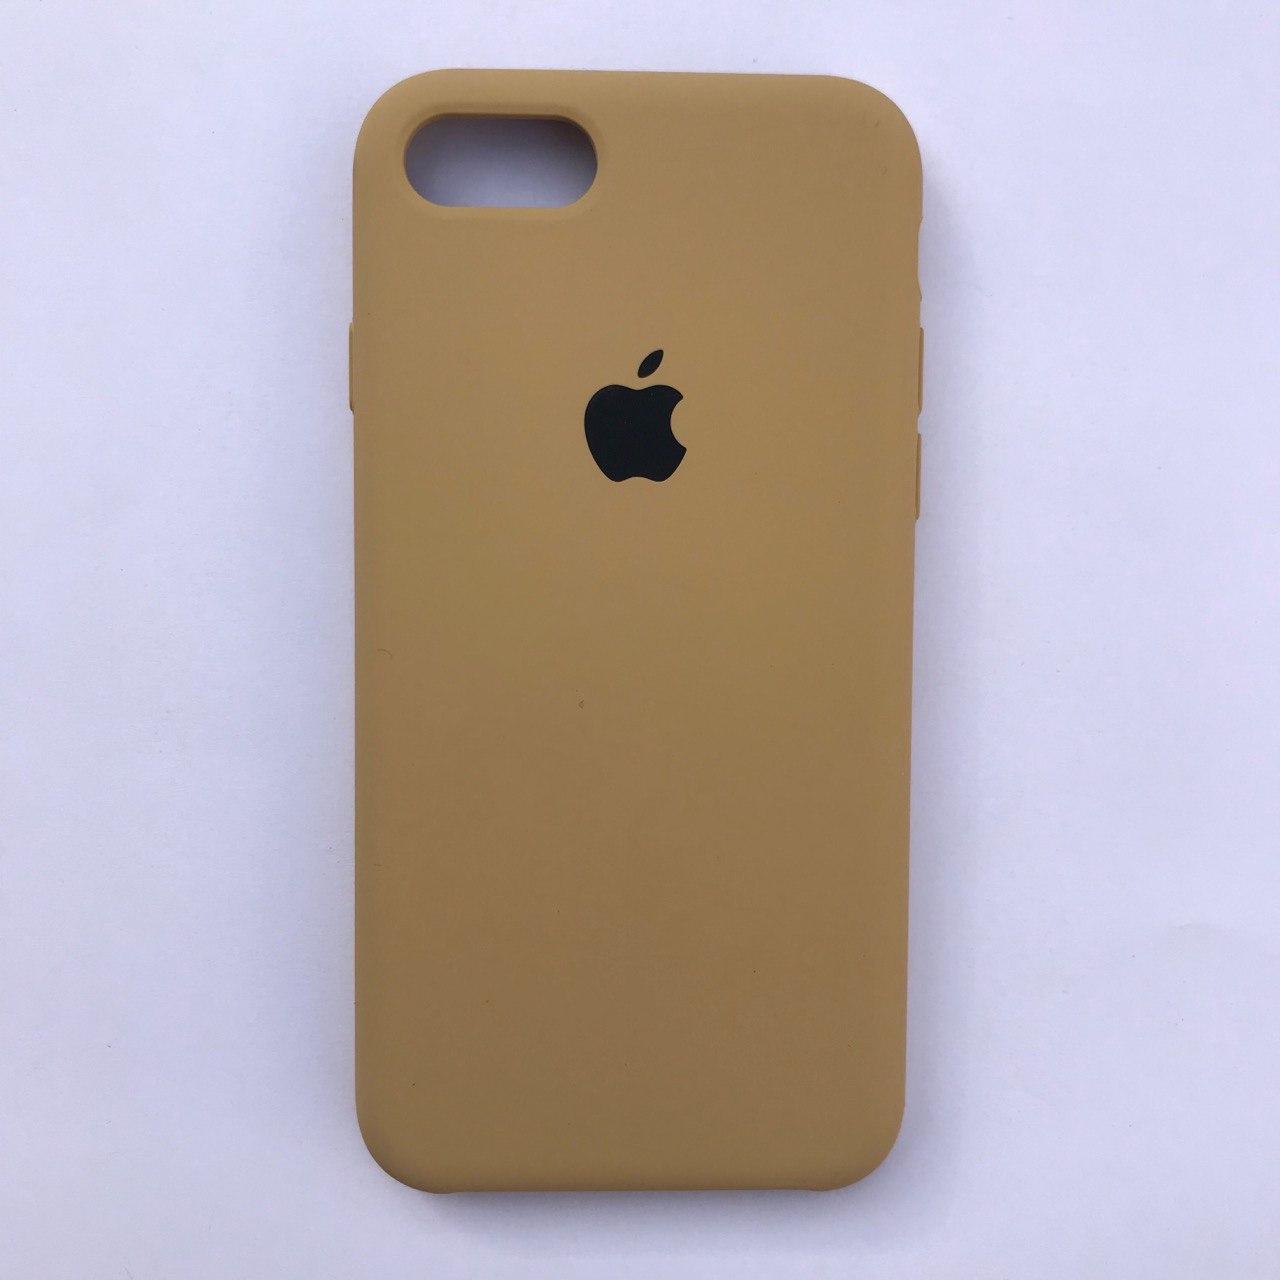 Чехол-накладка Silicone Case для Apple iPhone 7 iPhone 8 Gold